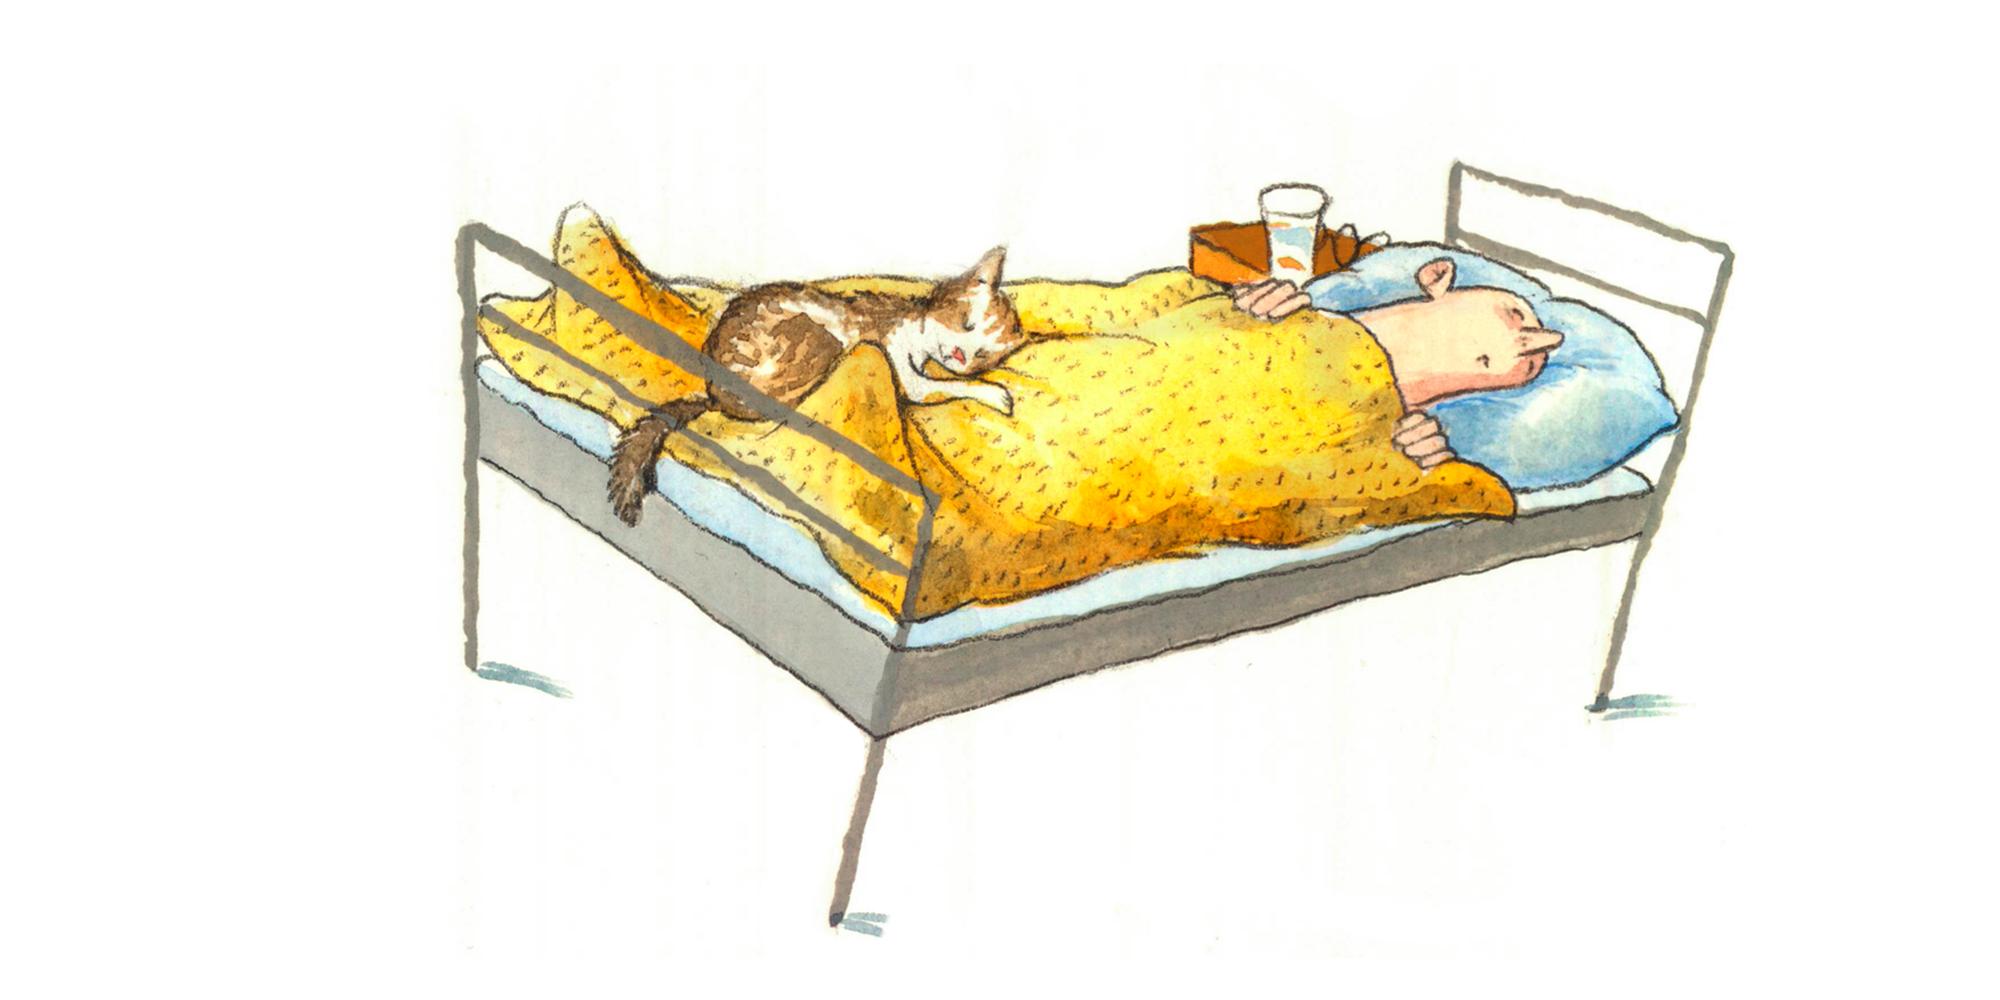 Fakta_190906_Kanda-katter_Oscar